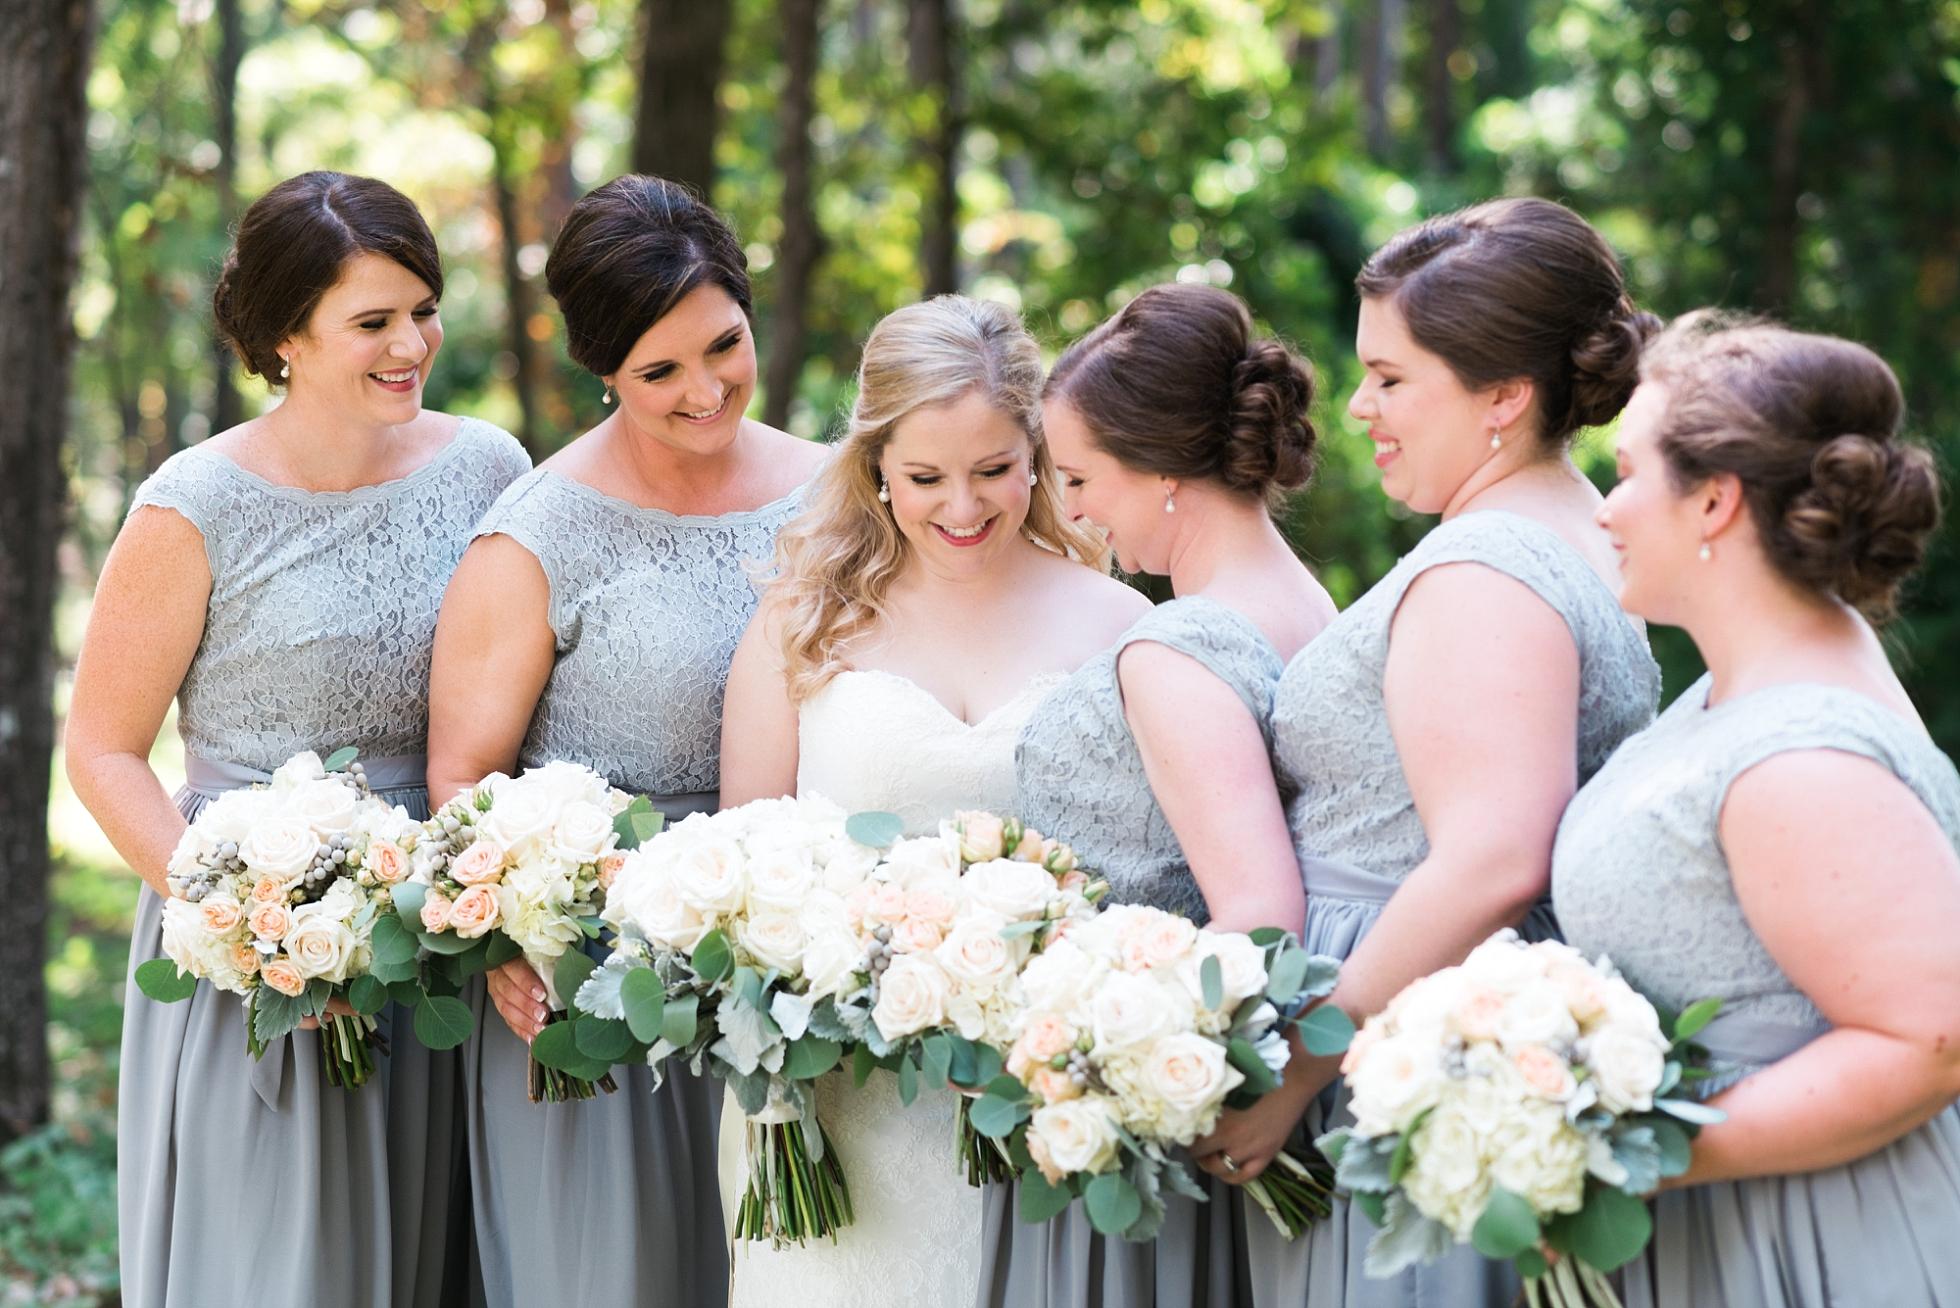 Bridesmaids with Bride | Kyle & Erin | Scarbrough Wedding | Children's Harbor | Laura Wilkerson Photography